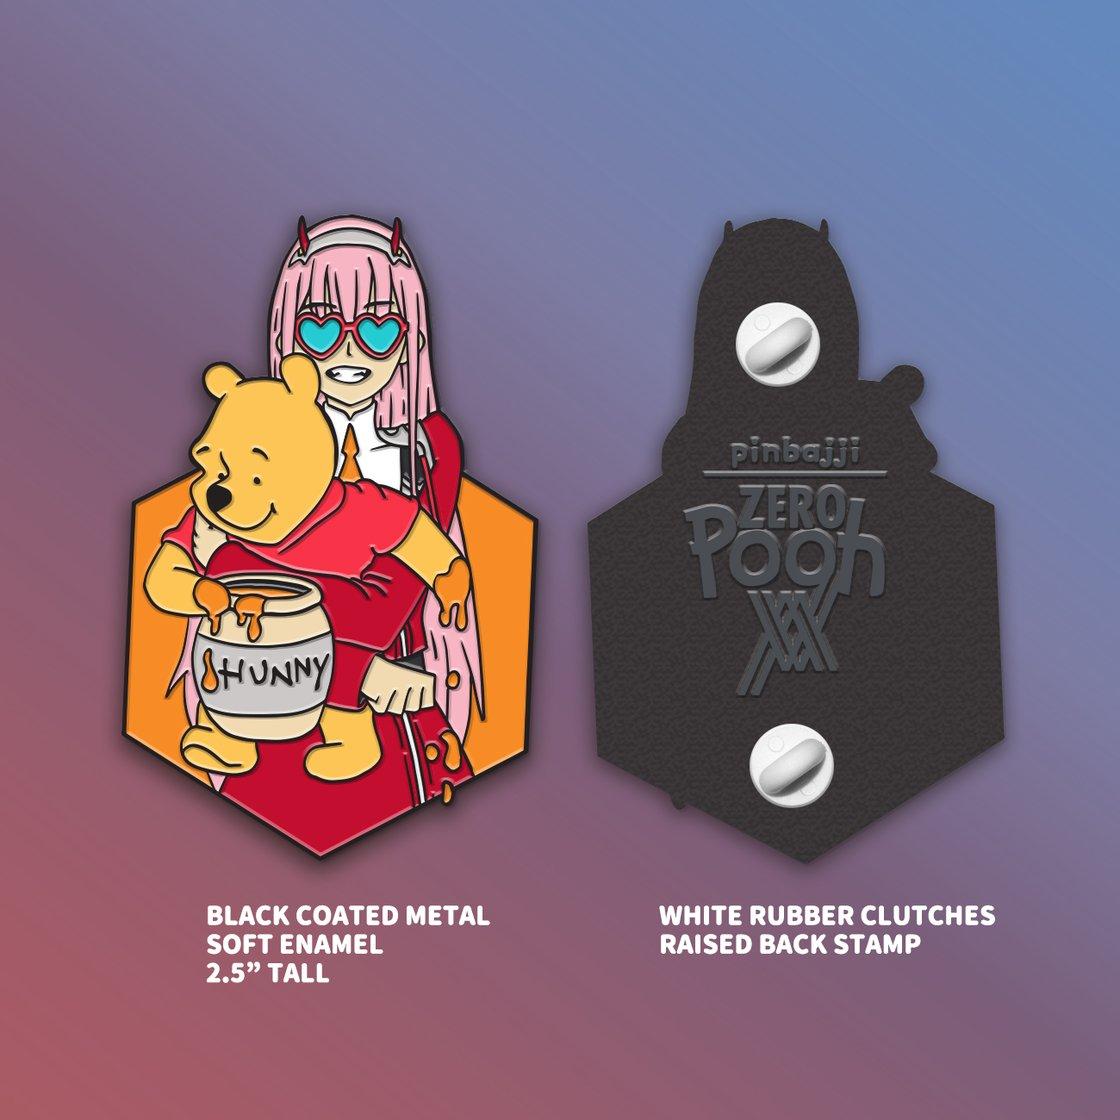 Image of Zero Pooh Pin